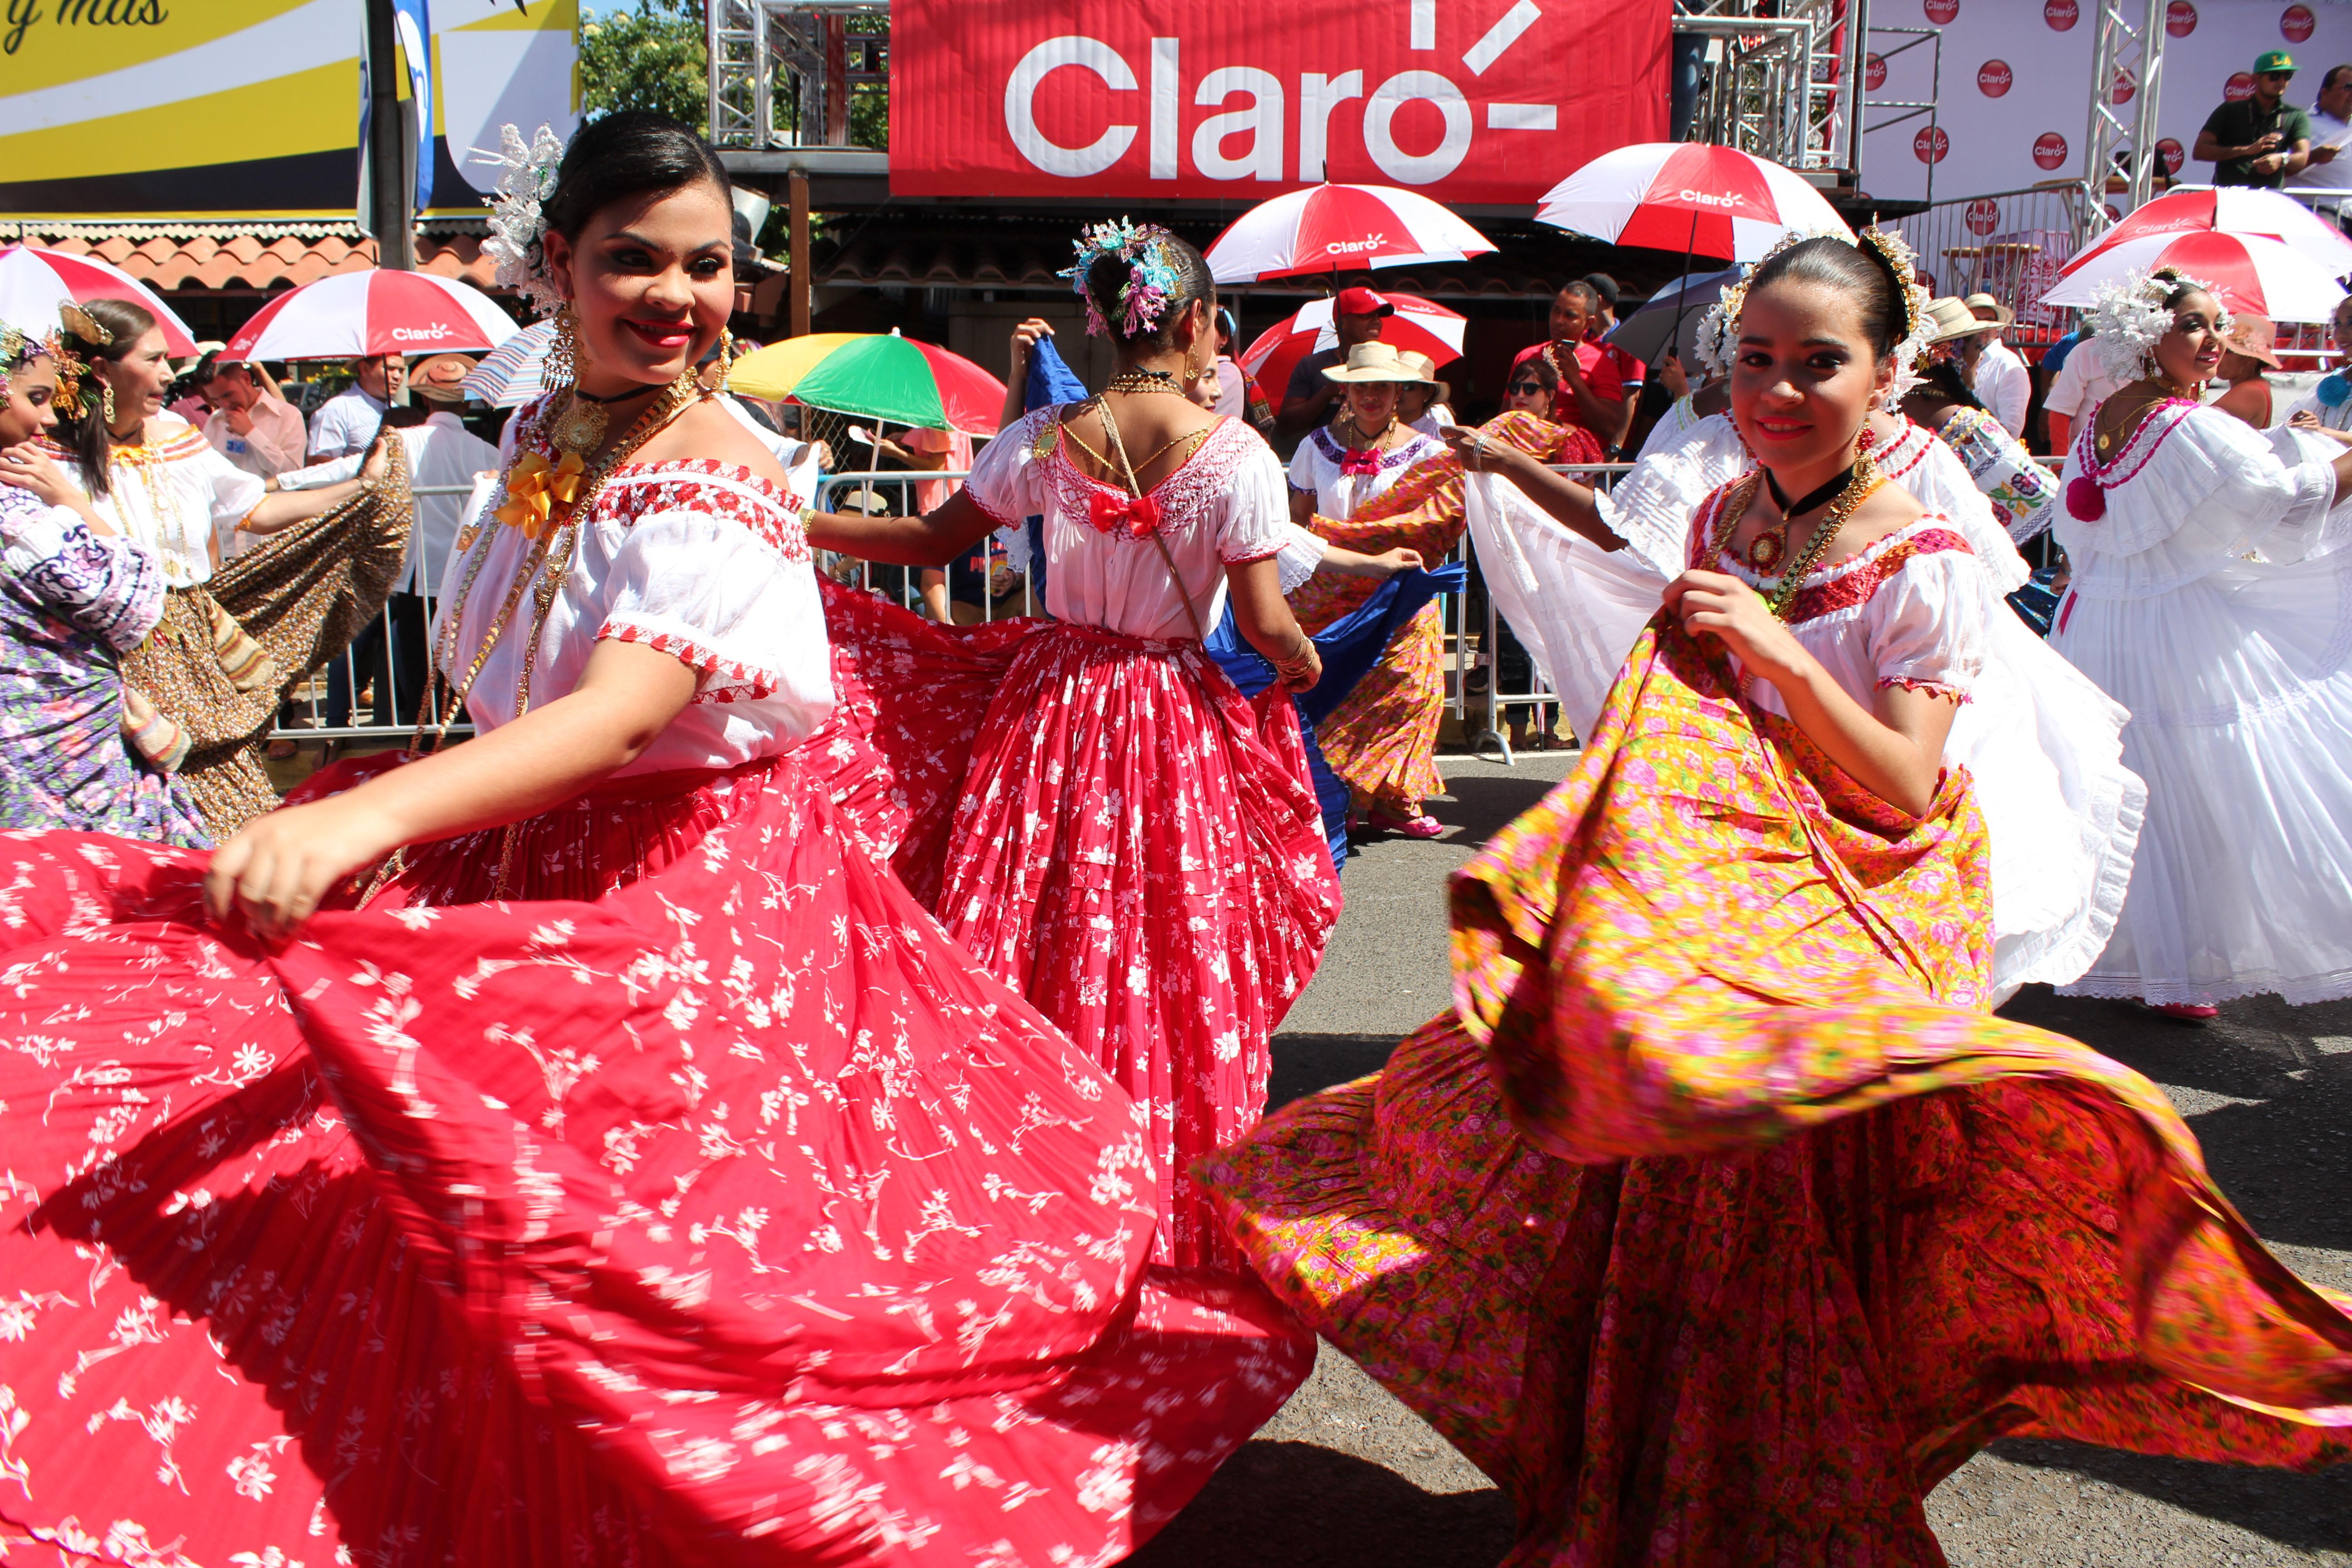 swirling-skirts-pollera-parade-2 A Panama Road Trip Panama Panama Fairs and Festivals